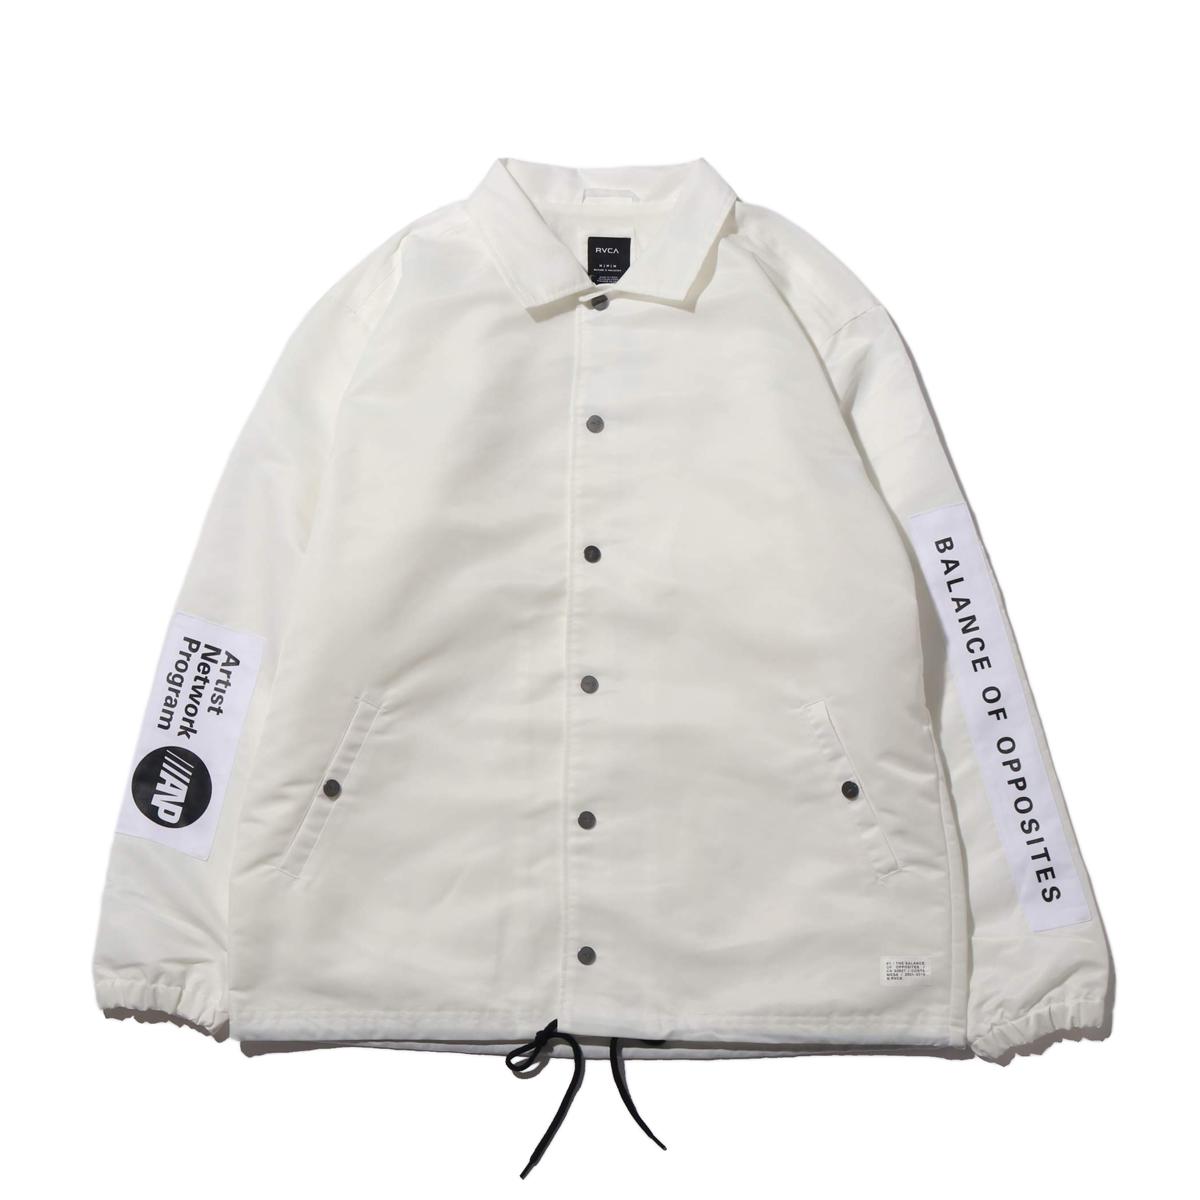 RVCA PATCH JACKET(ルーカ パッチ ジャケット)WHITE【メンズ ジャケット】19FA-I